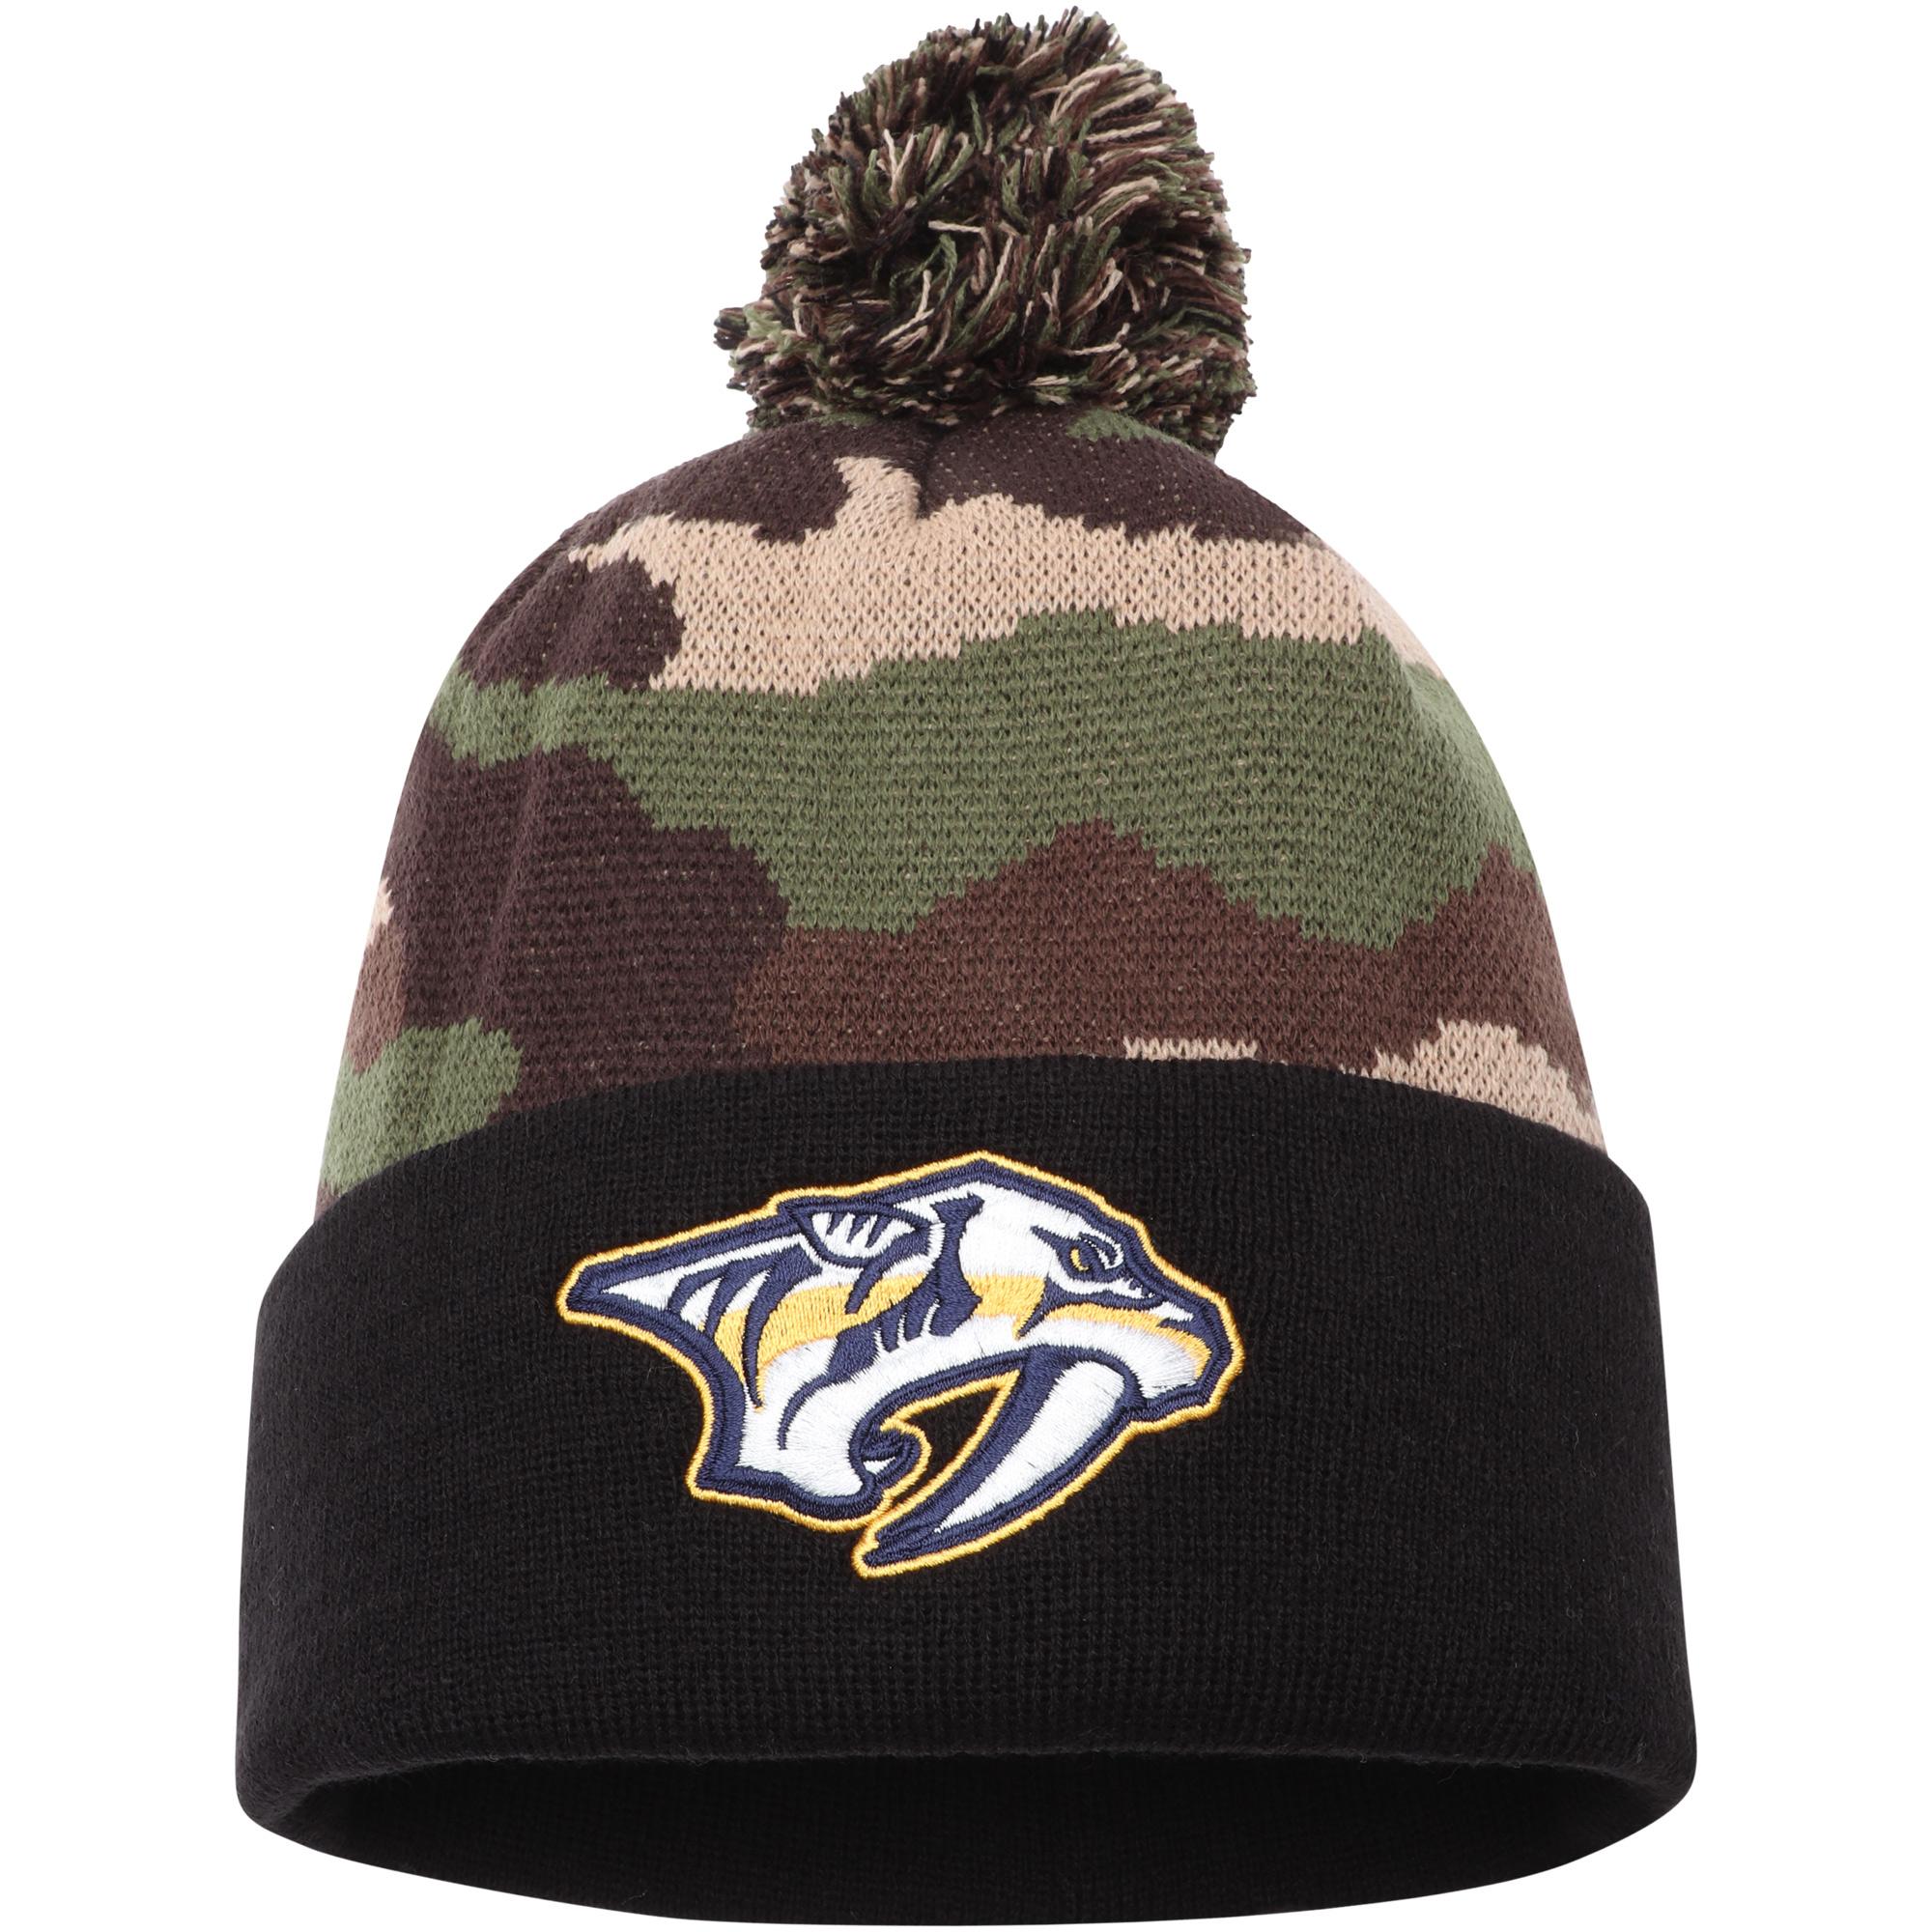 Nashville Predators American Needle Cuffed Pom Knit Hat - Camo - OSFA